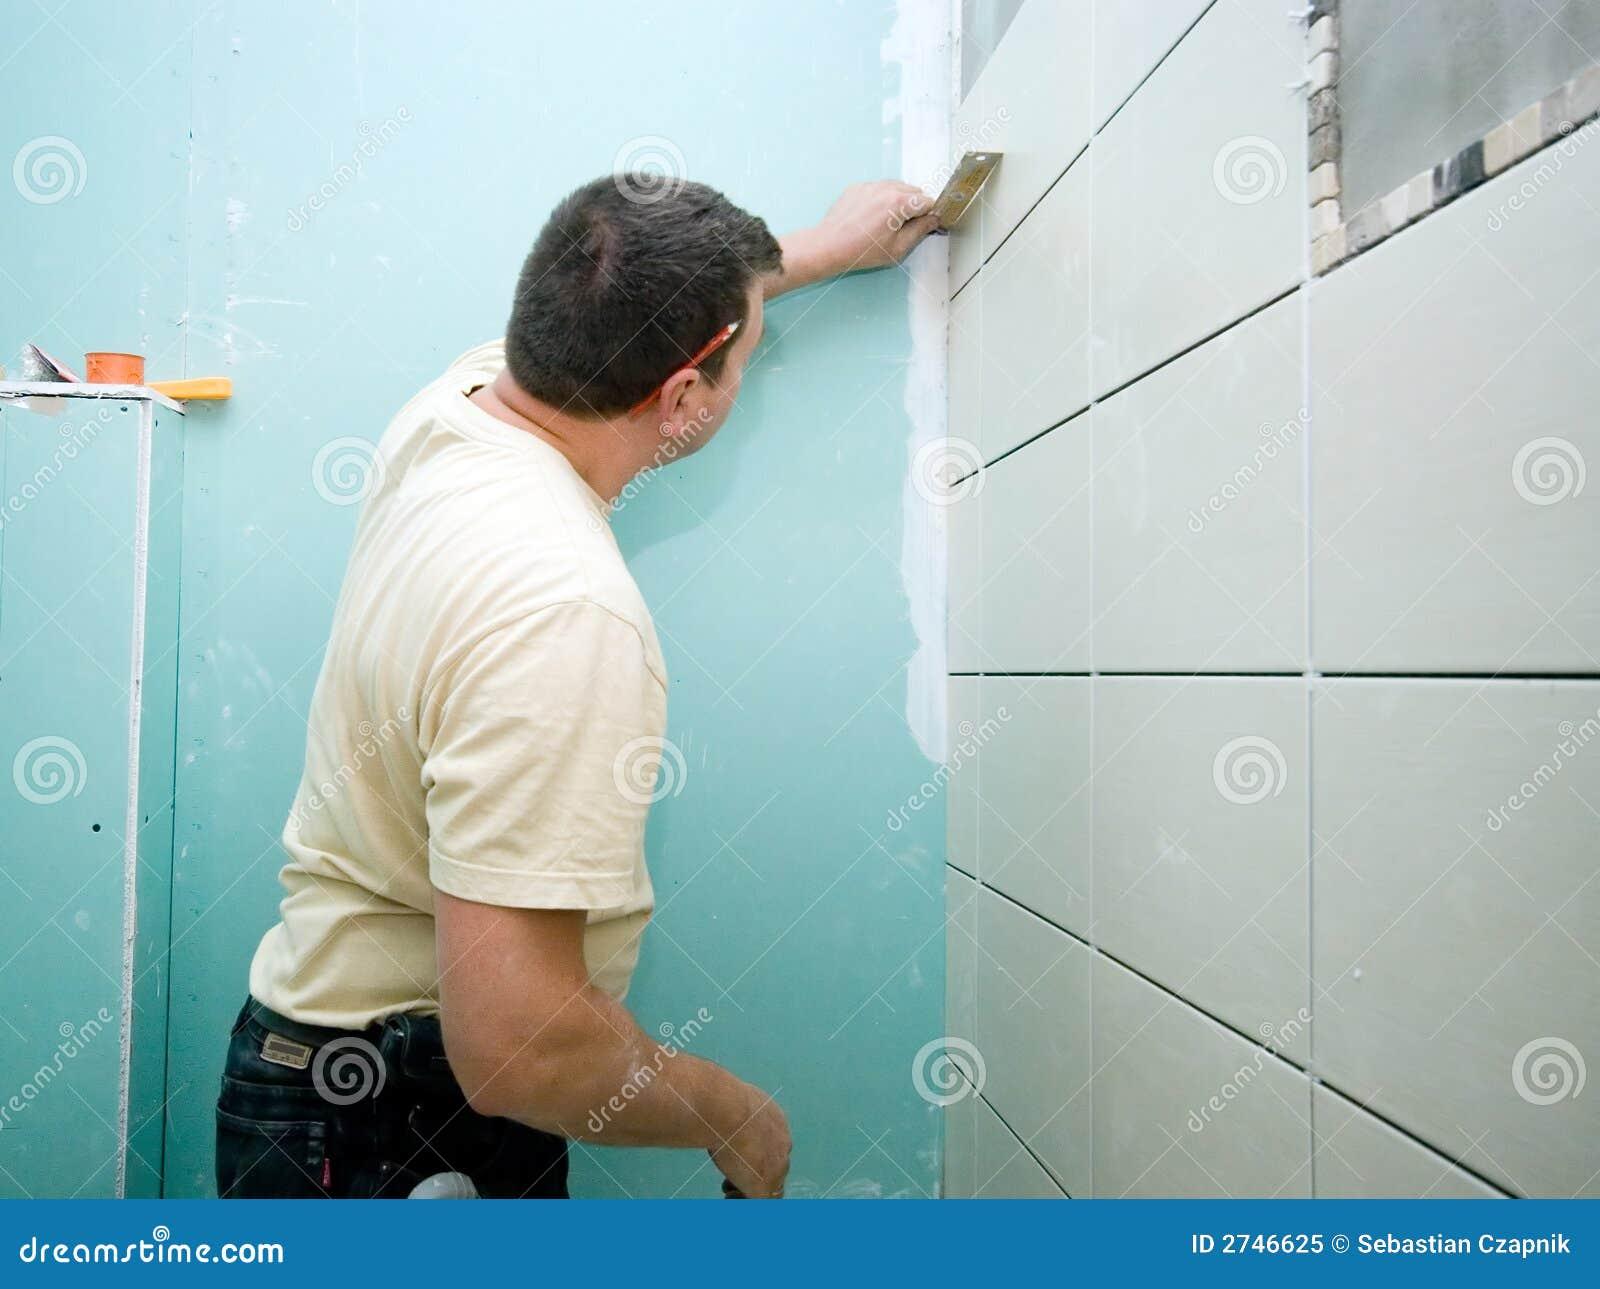 Bathroom tiles renovation stock image. Image of install - 2746625